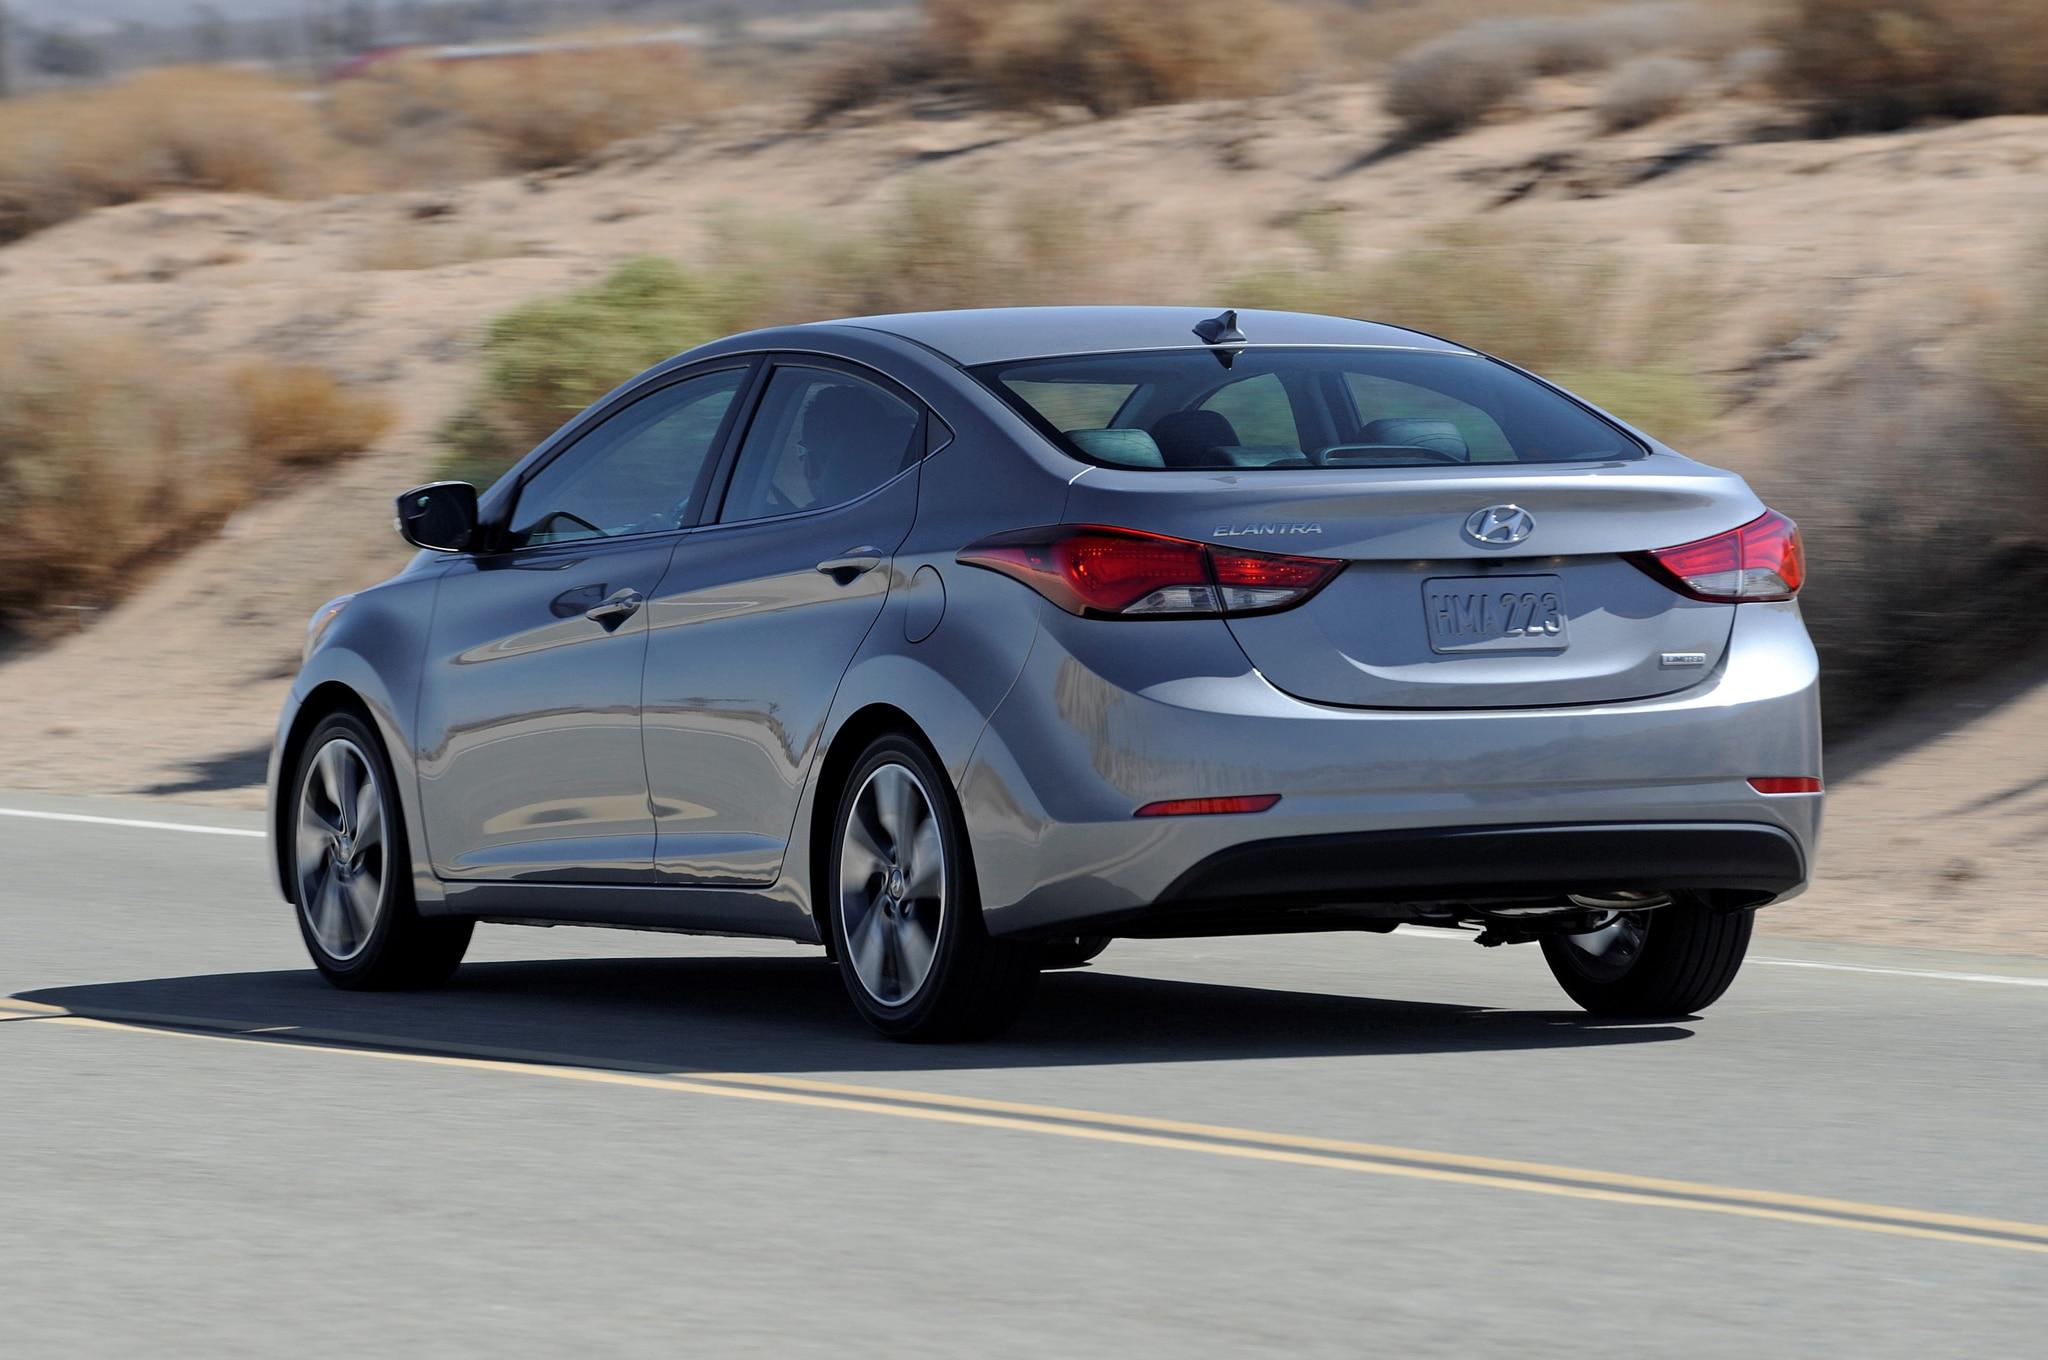 2015 Hyundai Elantra Priced from 18060